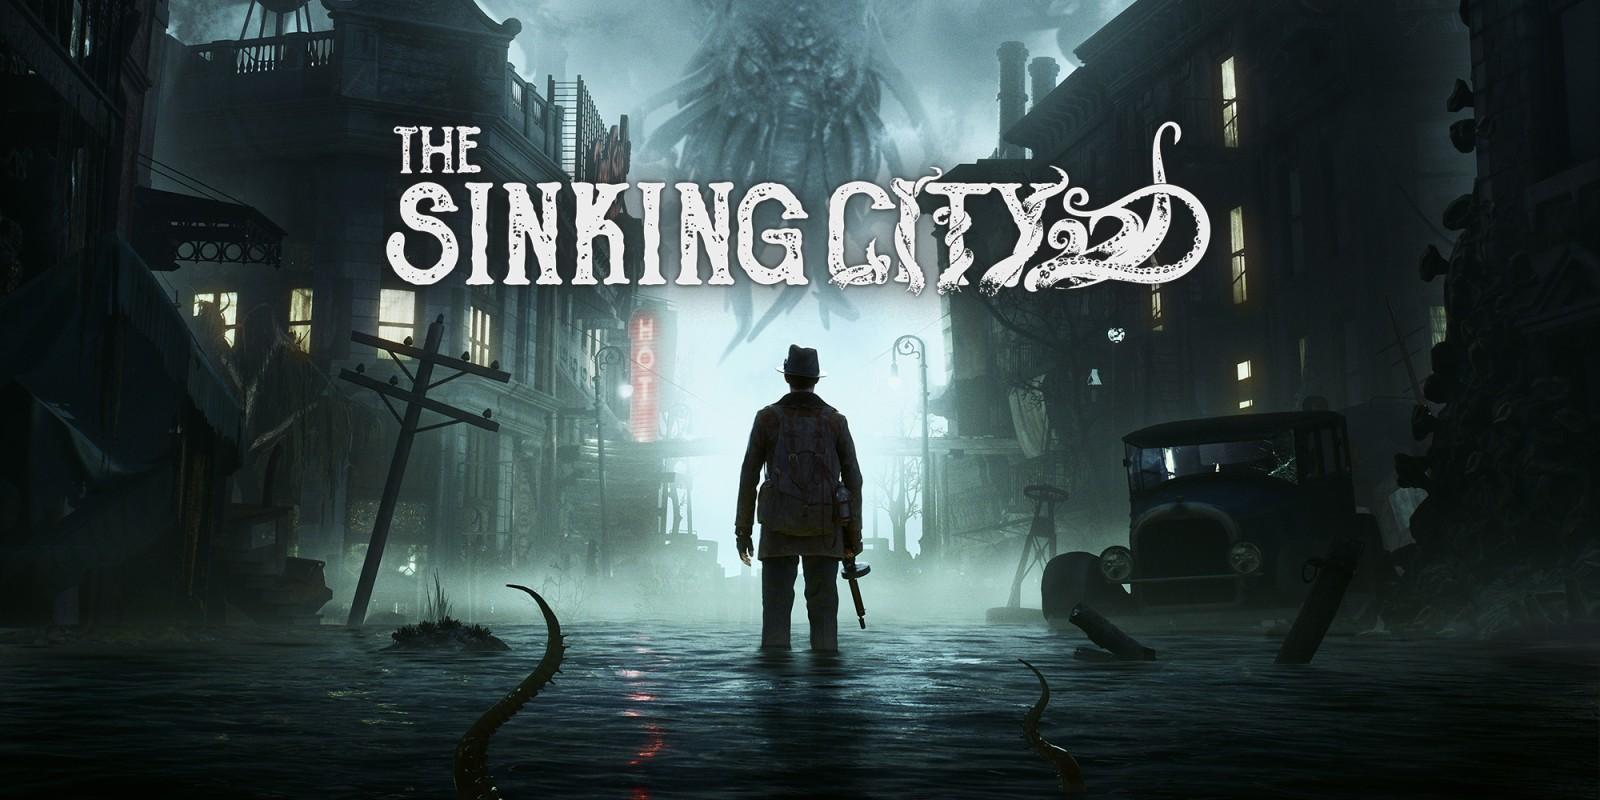 the sinking city + podarok [epic] 99 rur